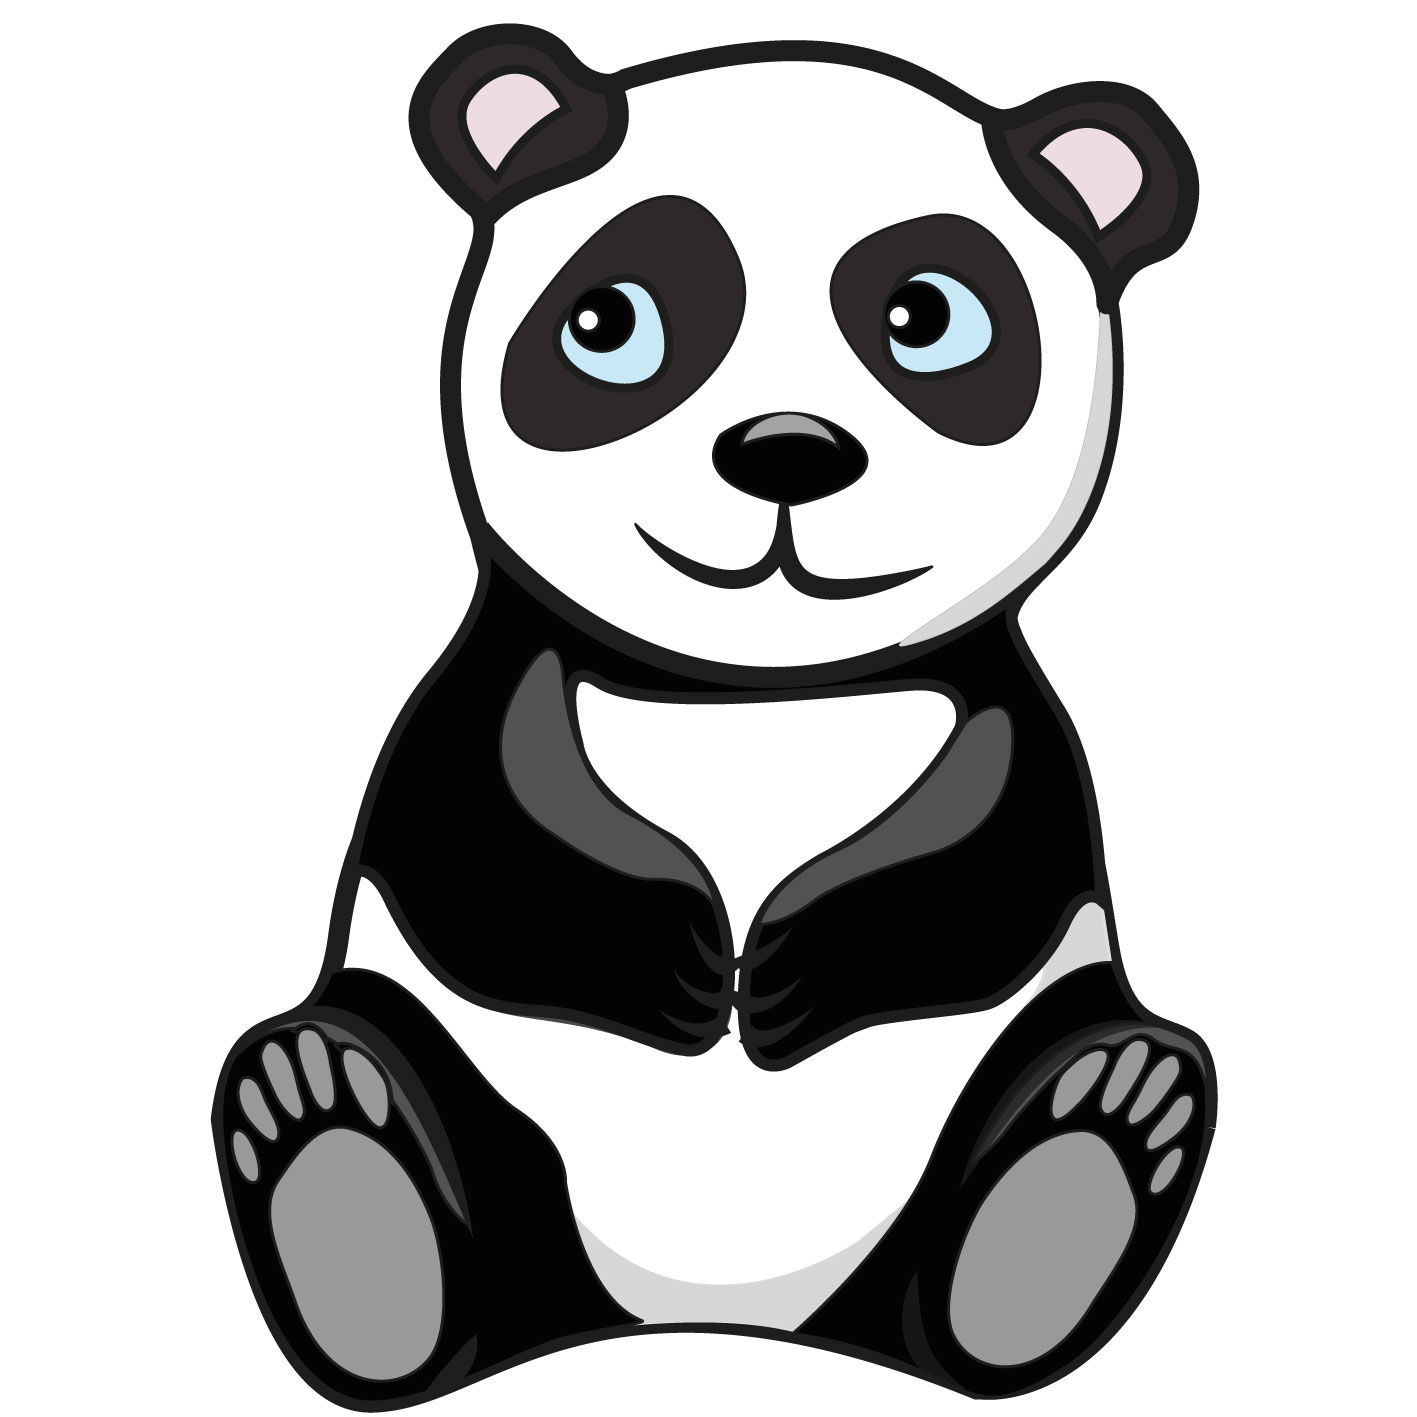 Dessins en couleurs imprimer panda num ro 286388 - Dessin kung fu panda ...